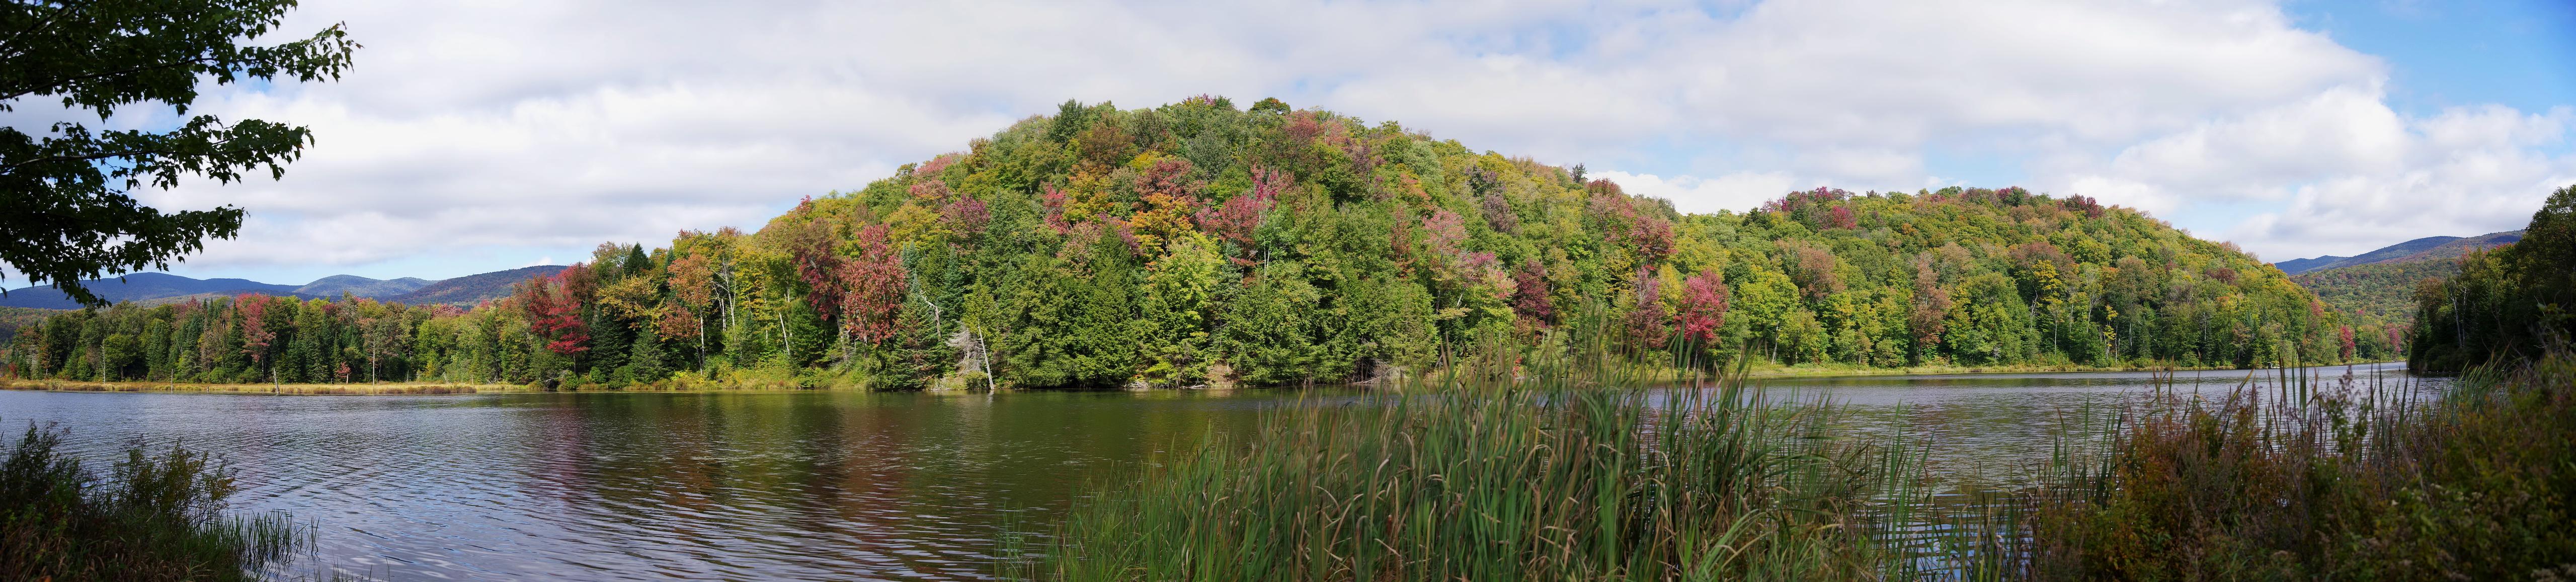 Belvidere Pond